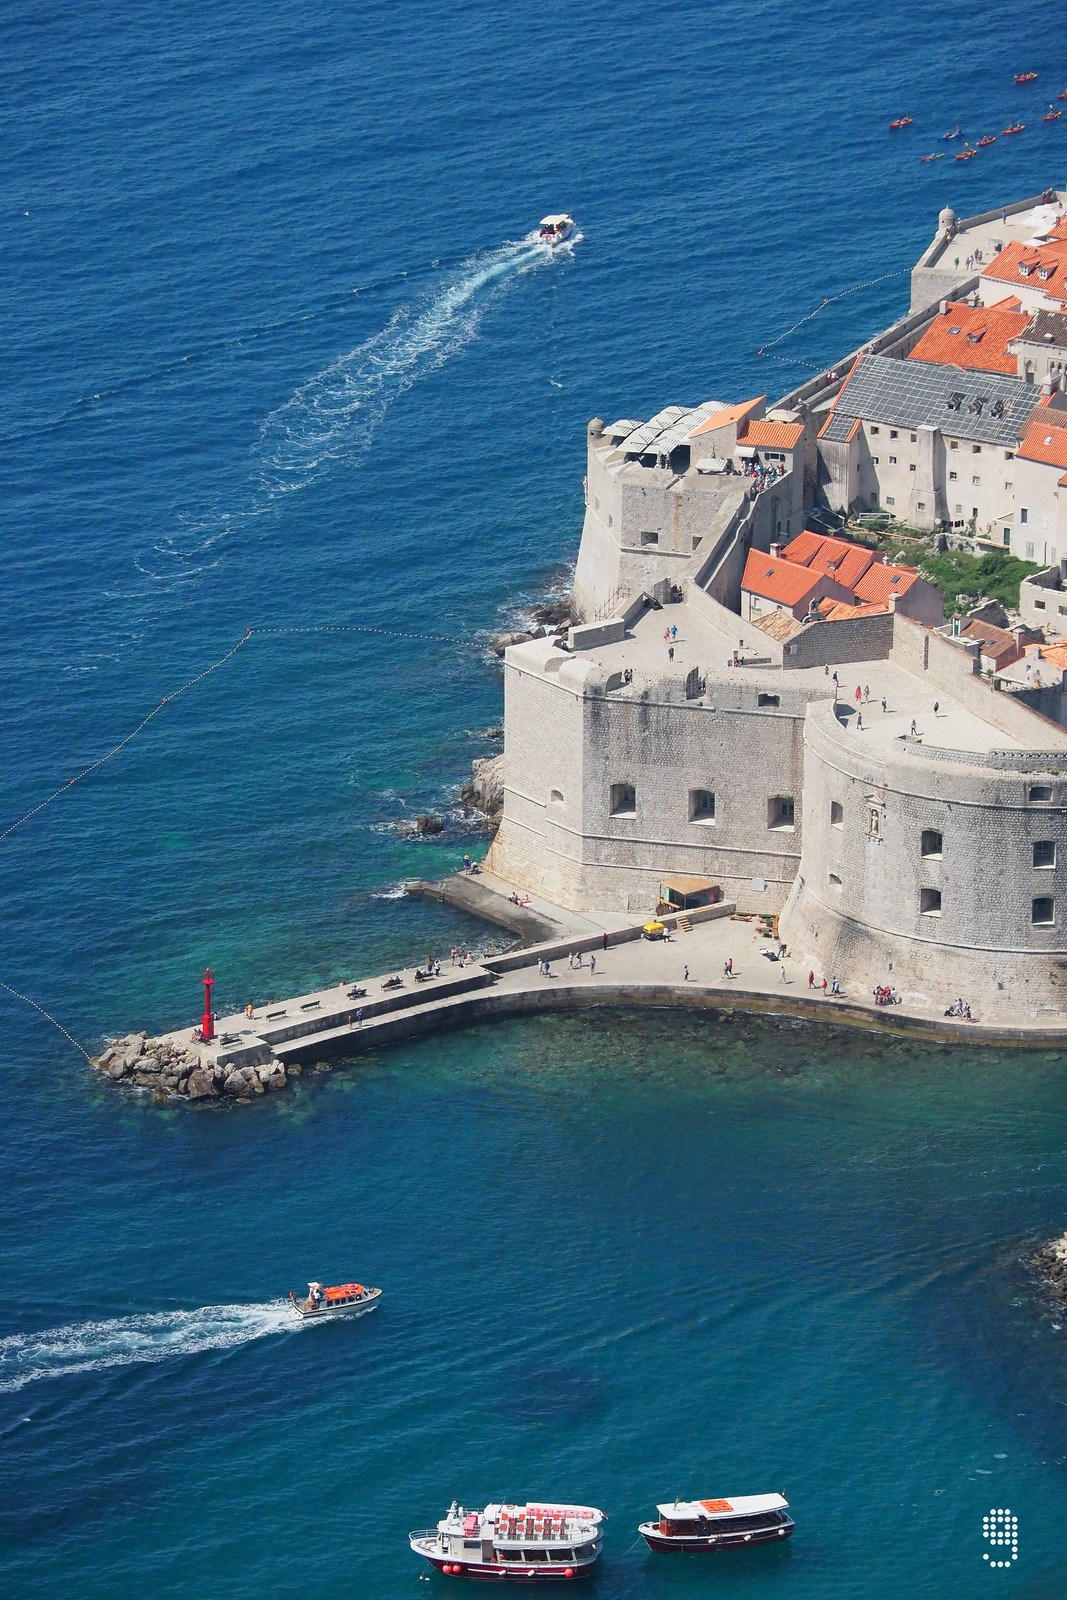 Mulo Tower 保護舊城港口的入口始建於1346年